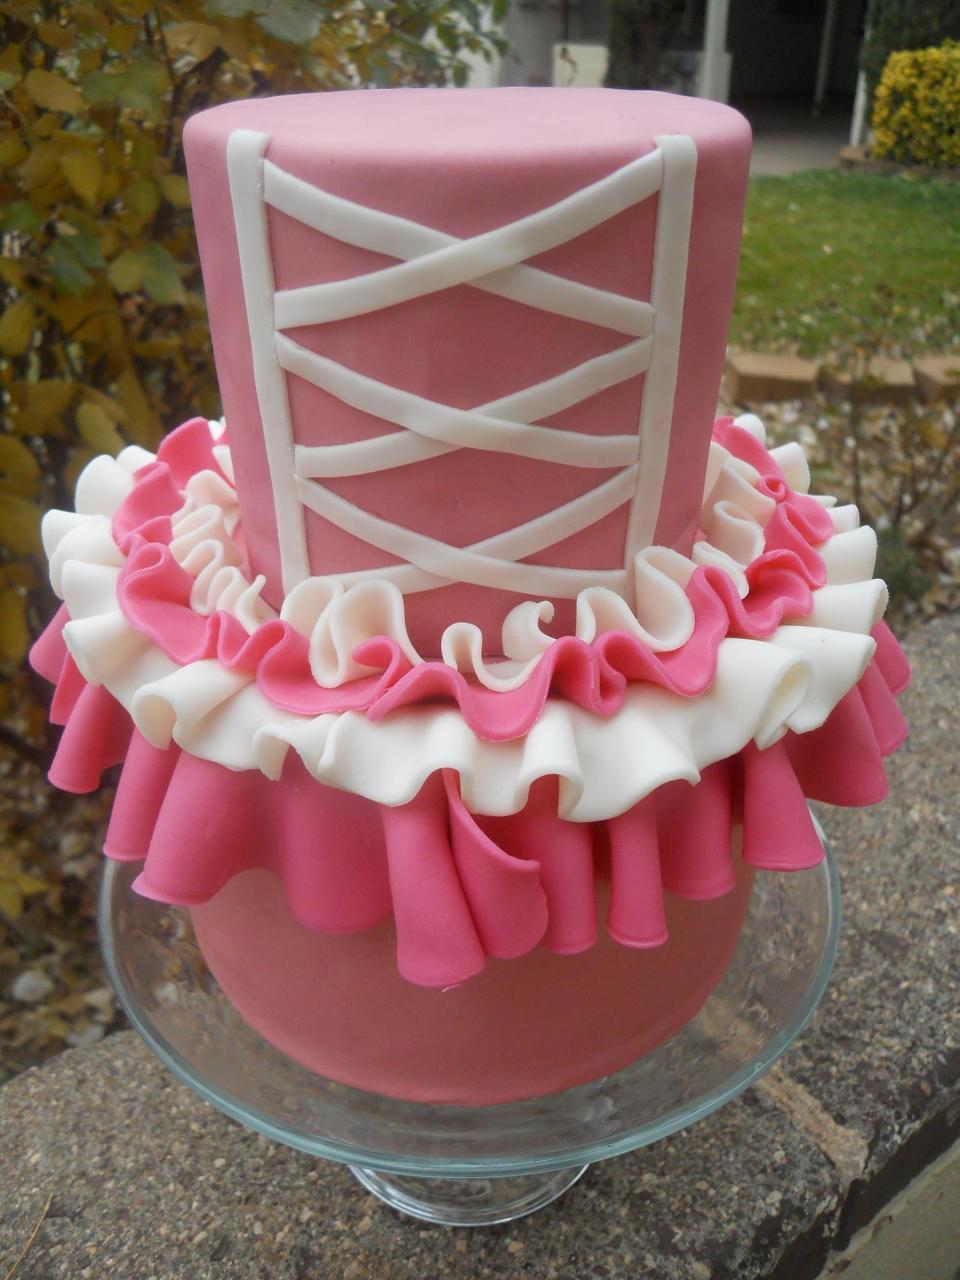 Mary Lous Cake Studio and Bakery  Wix.com